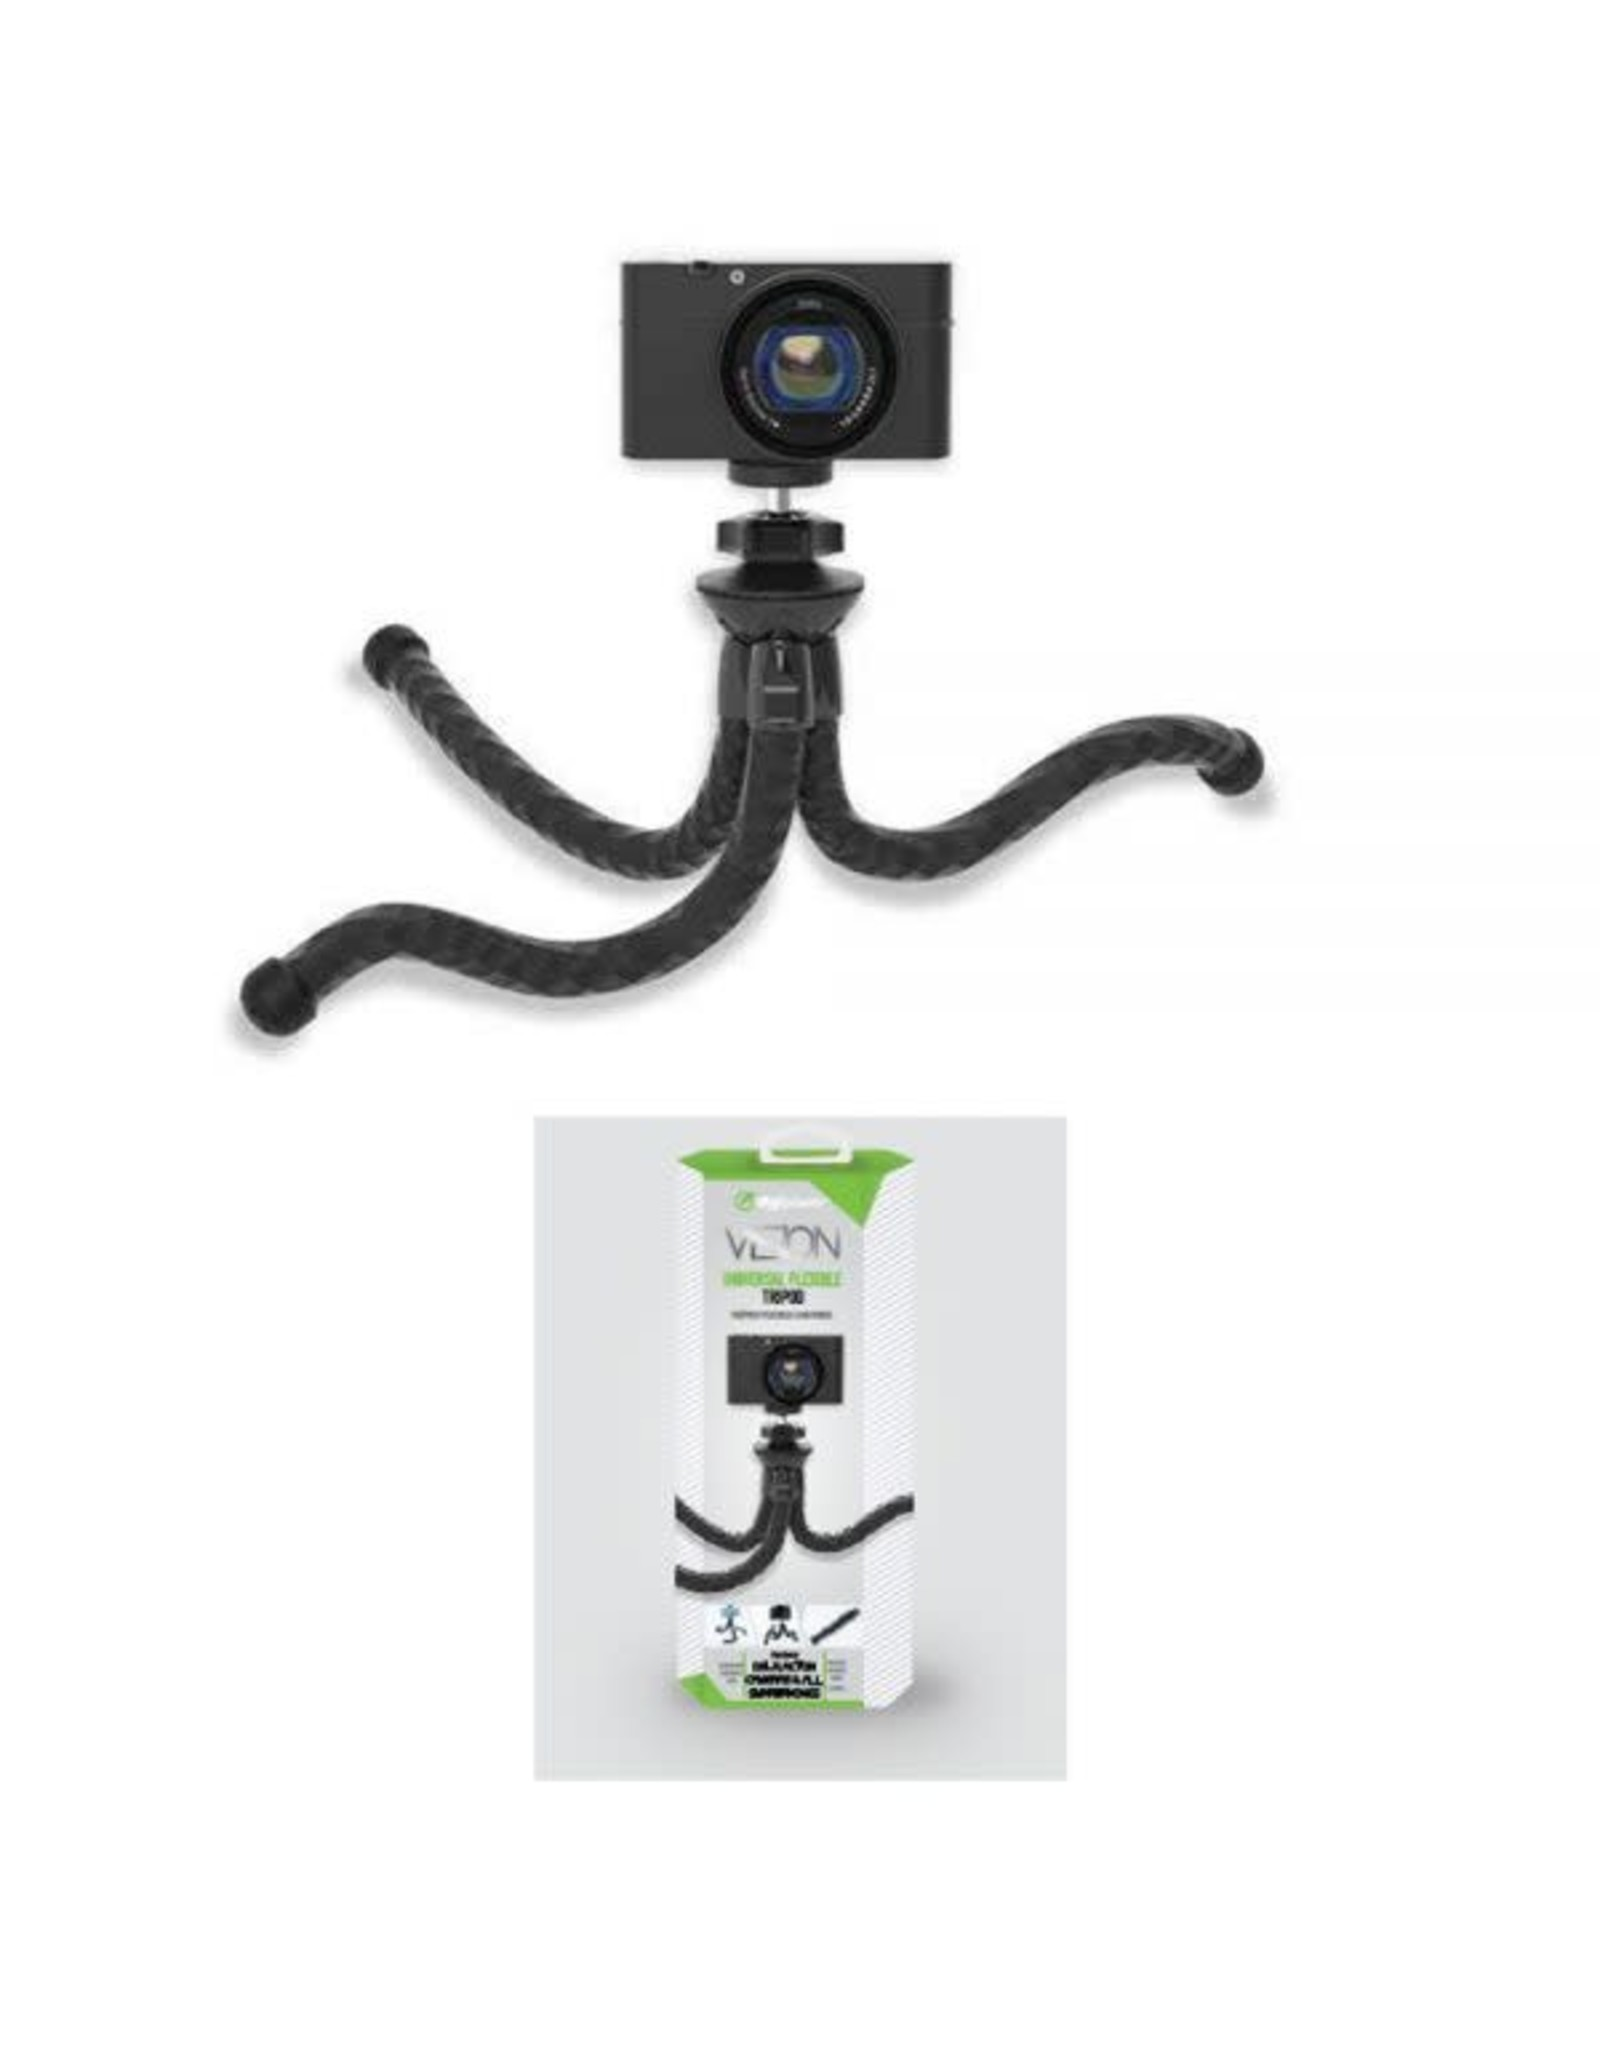 Digipower Digipower Vlogging Flexible Tripod Universal Smartphones SKU:50463